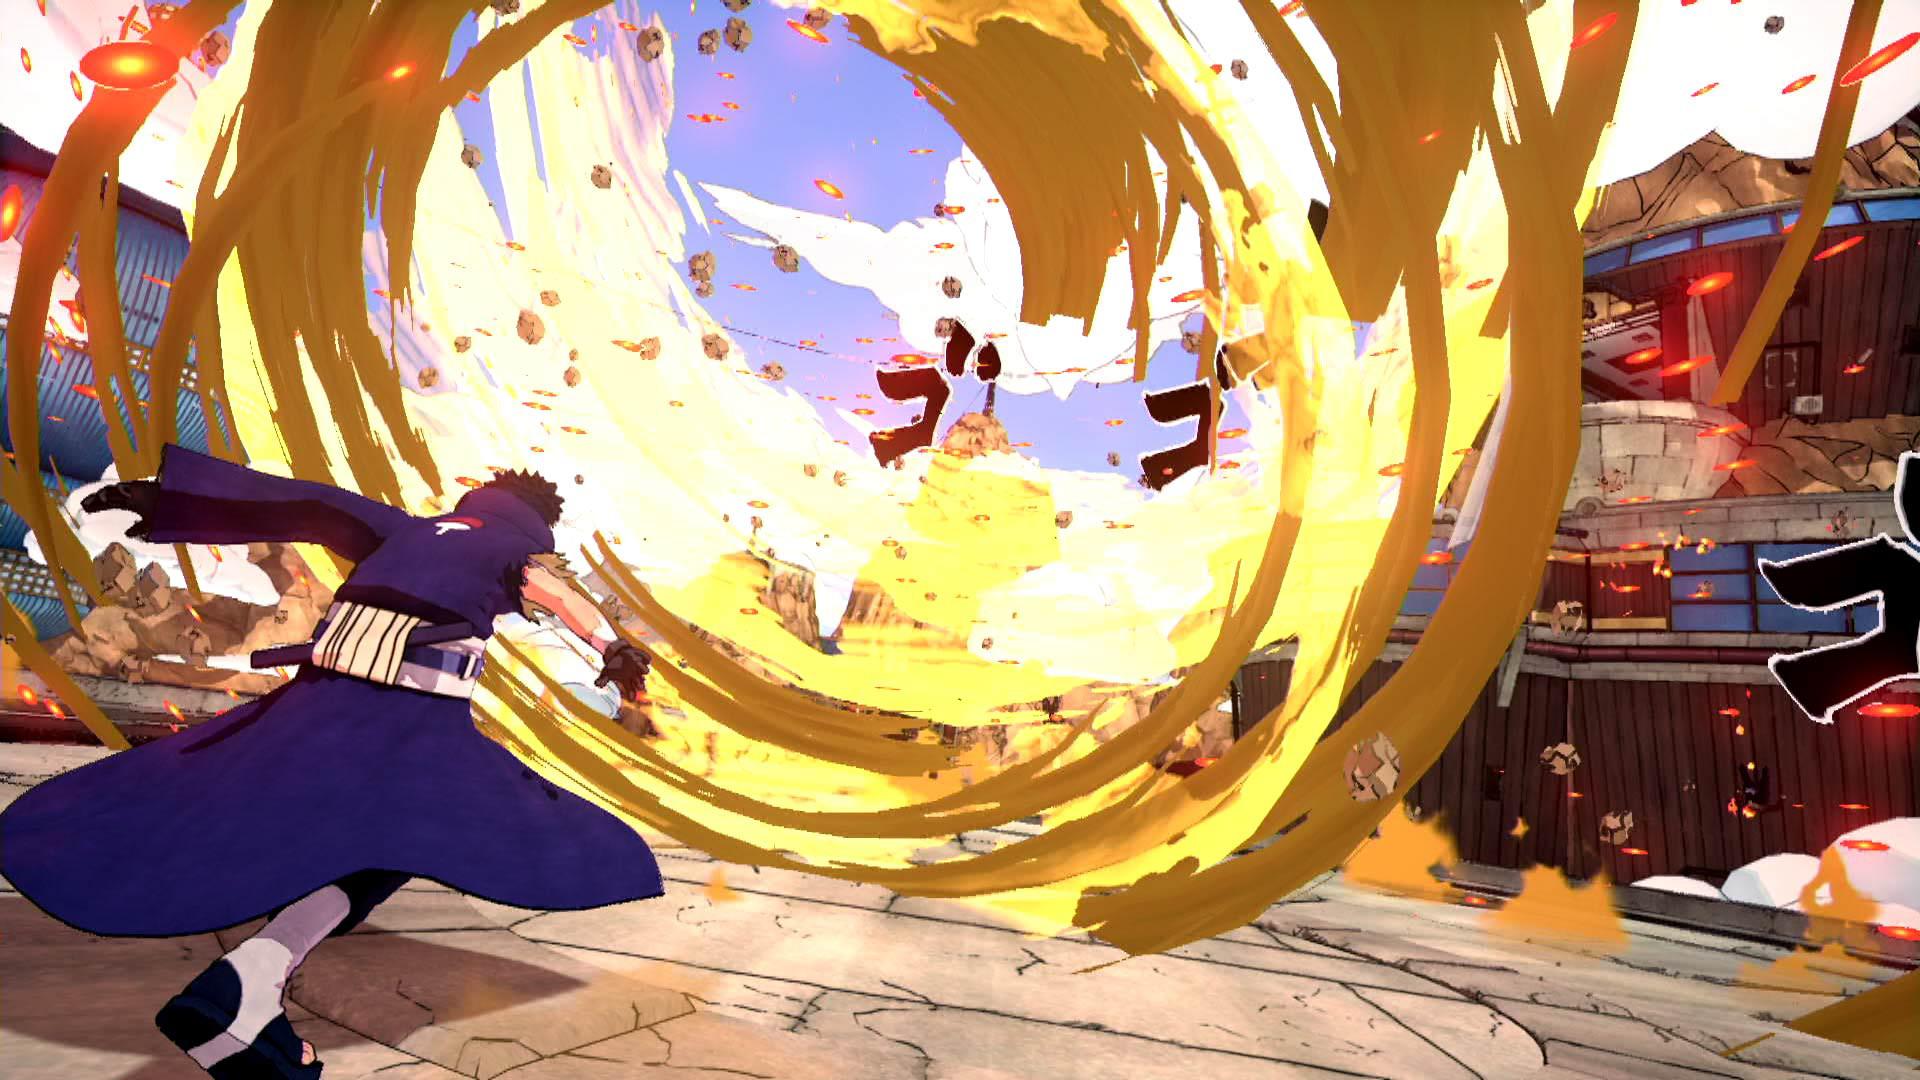 KHAiHOM.com - NTBSS: Master Character Training Pack - Obito Uchiha